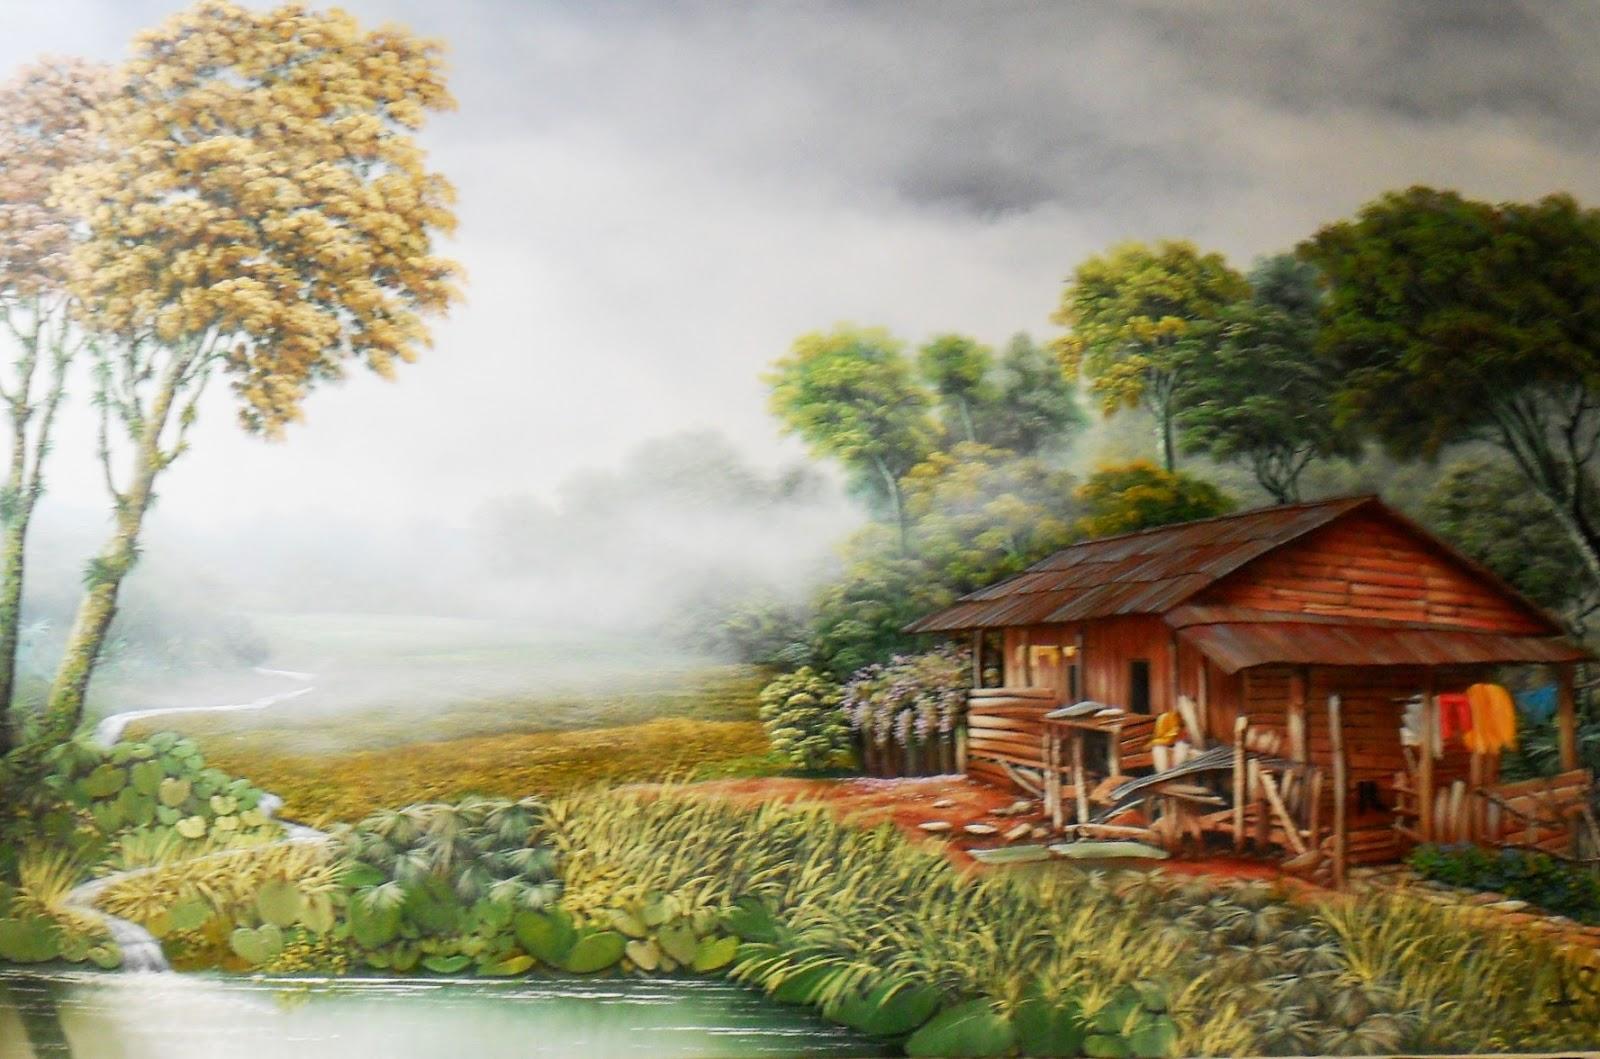 Pintura moderna y fotograf a art stica cuadros - Casas viejas al oleo ...